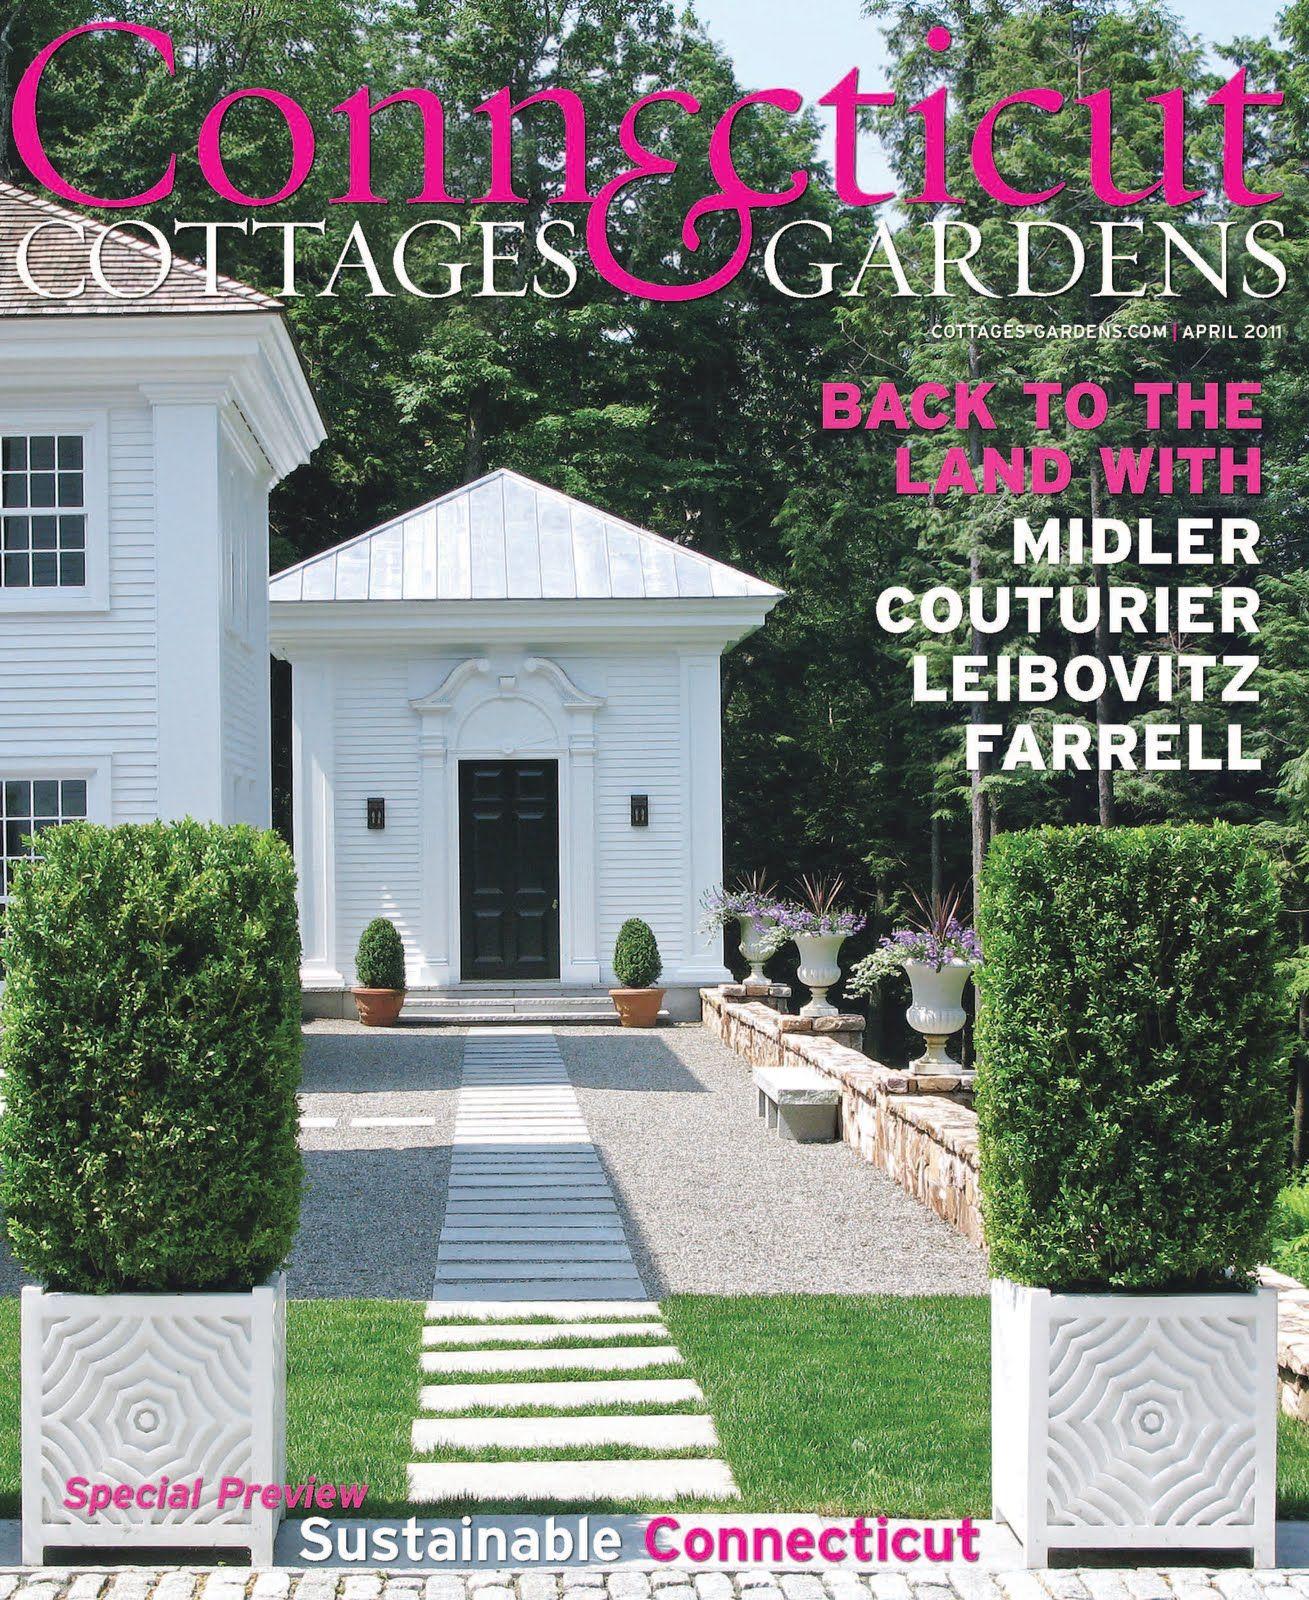 cottages and gardens magazine Αναζήτηση Google Cottage